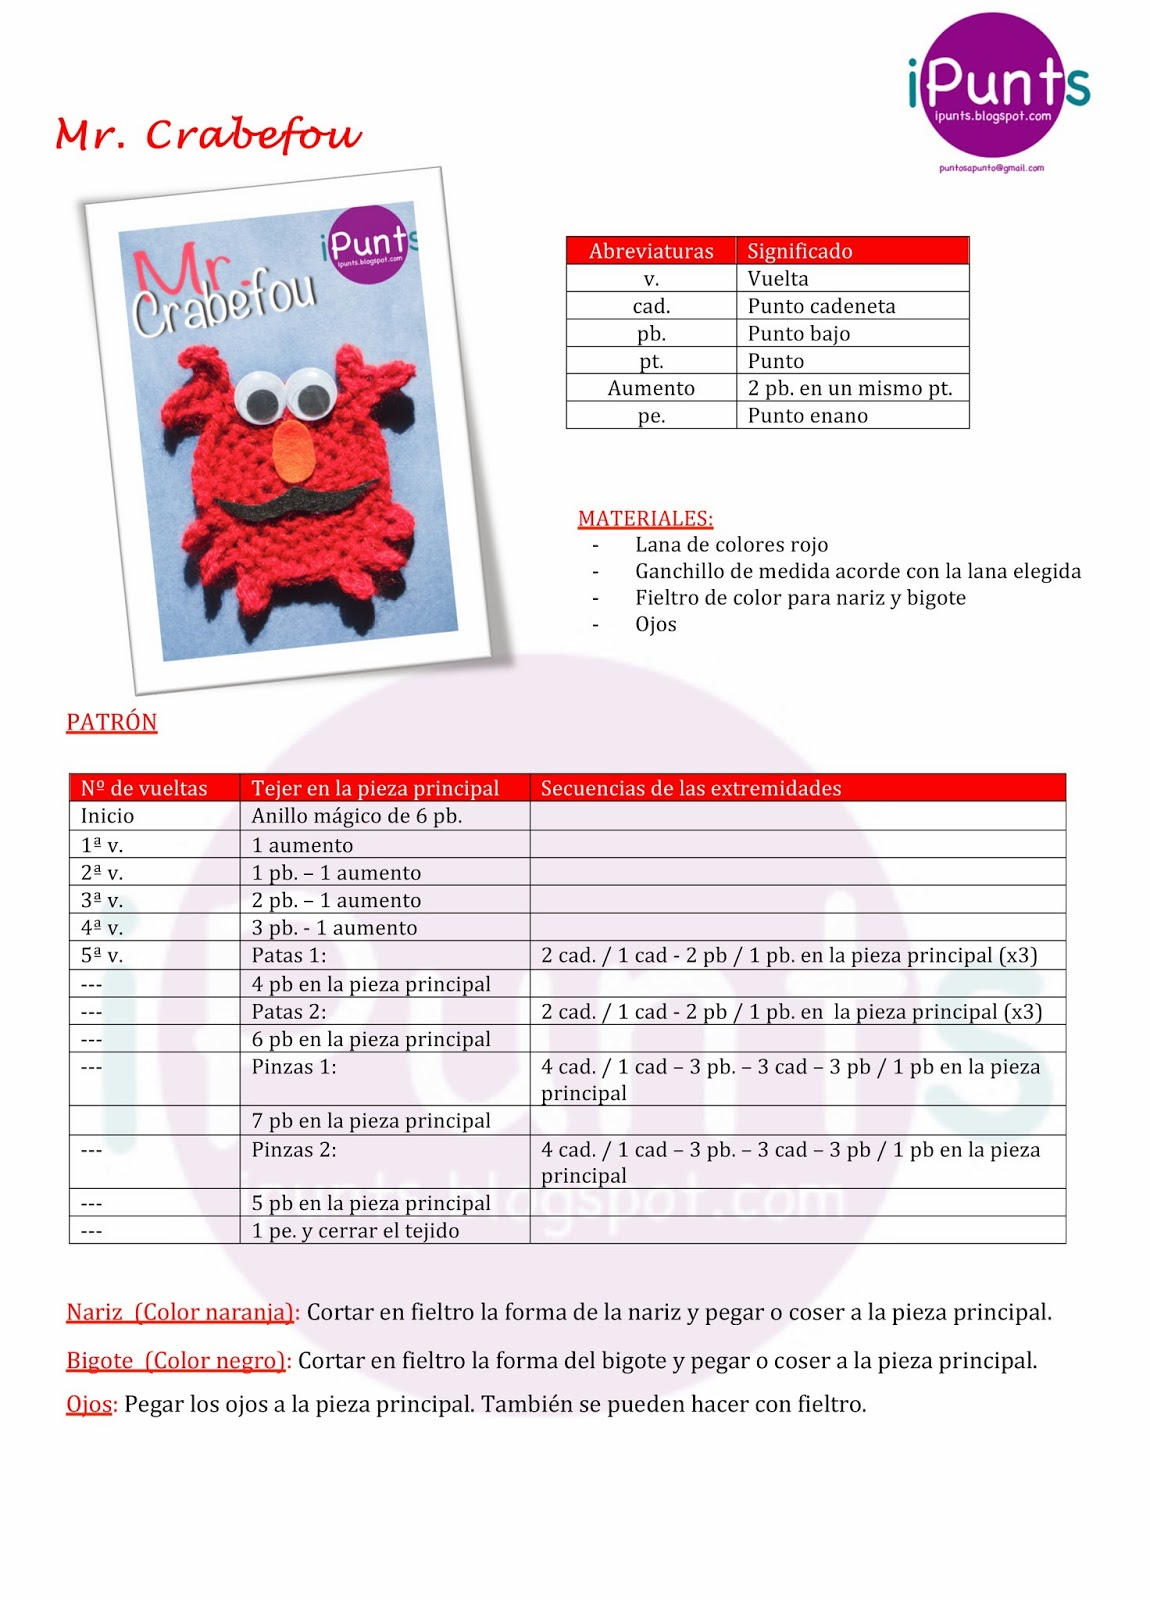 crabefou crochet patrón gratis ipunts